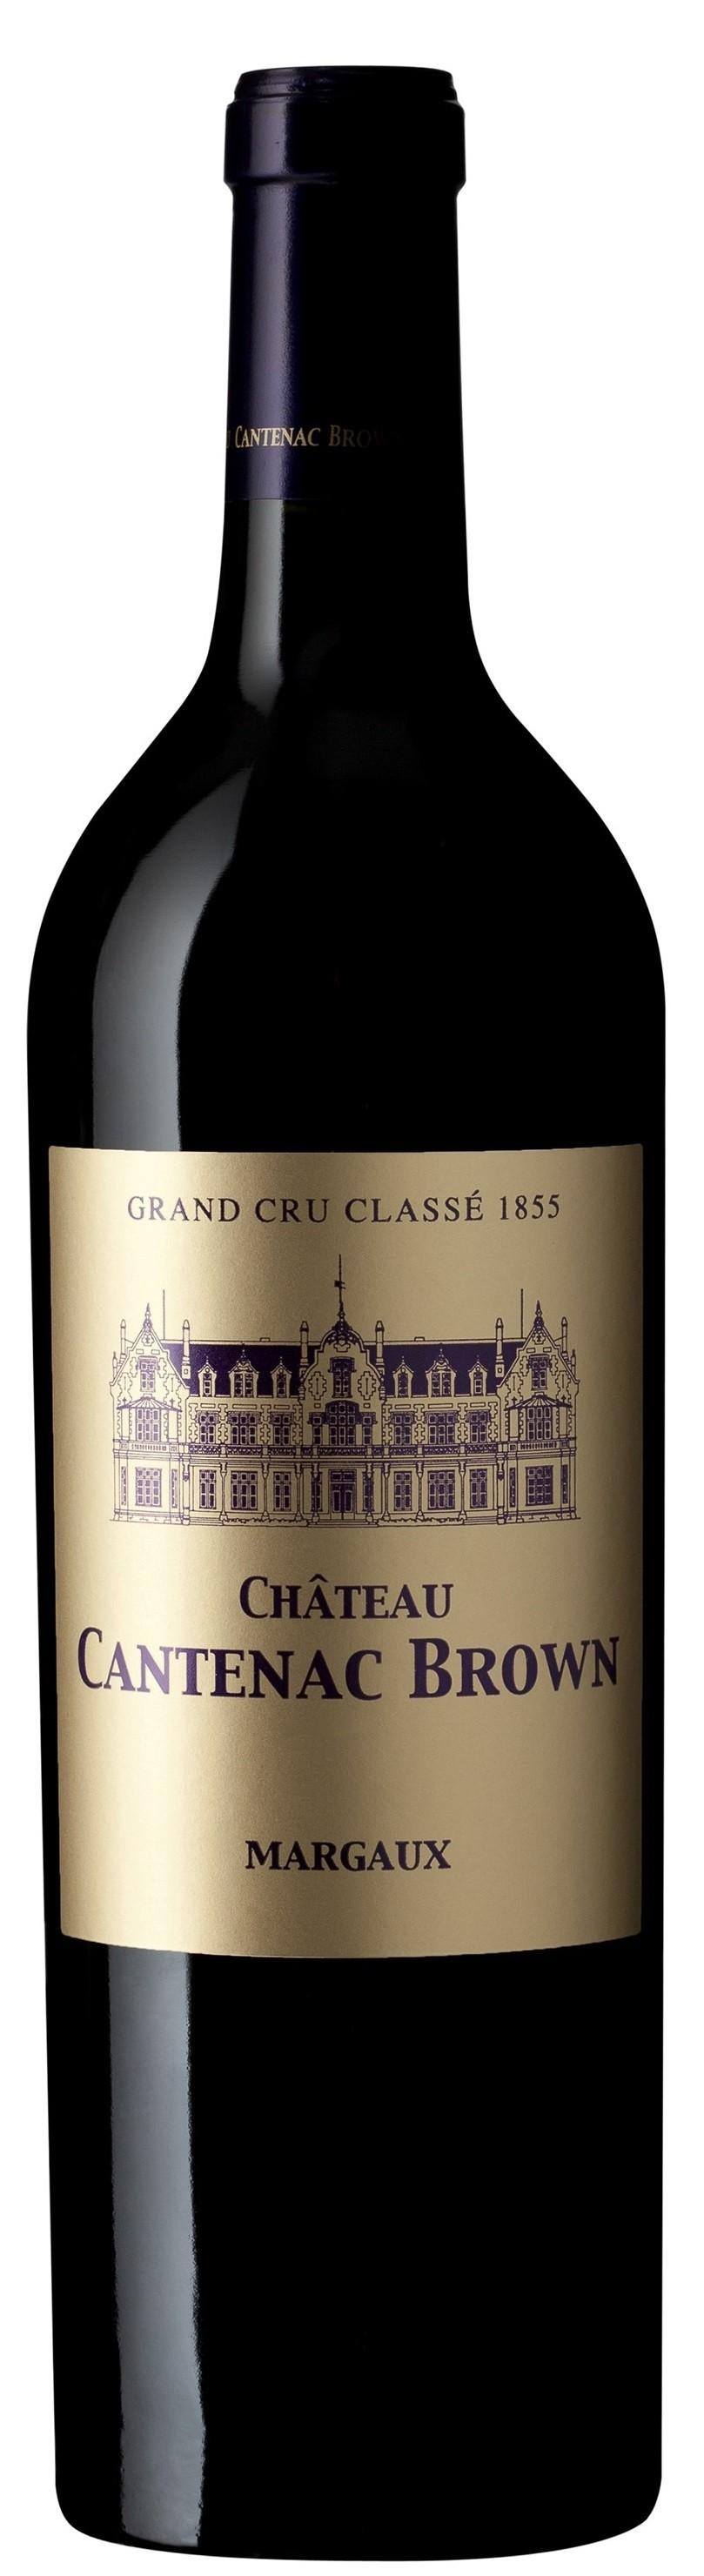 Chateau Cantenac Brown 2016, 0,375l, Margaux